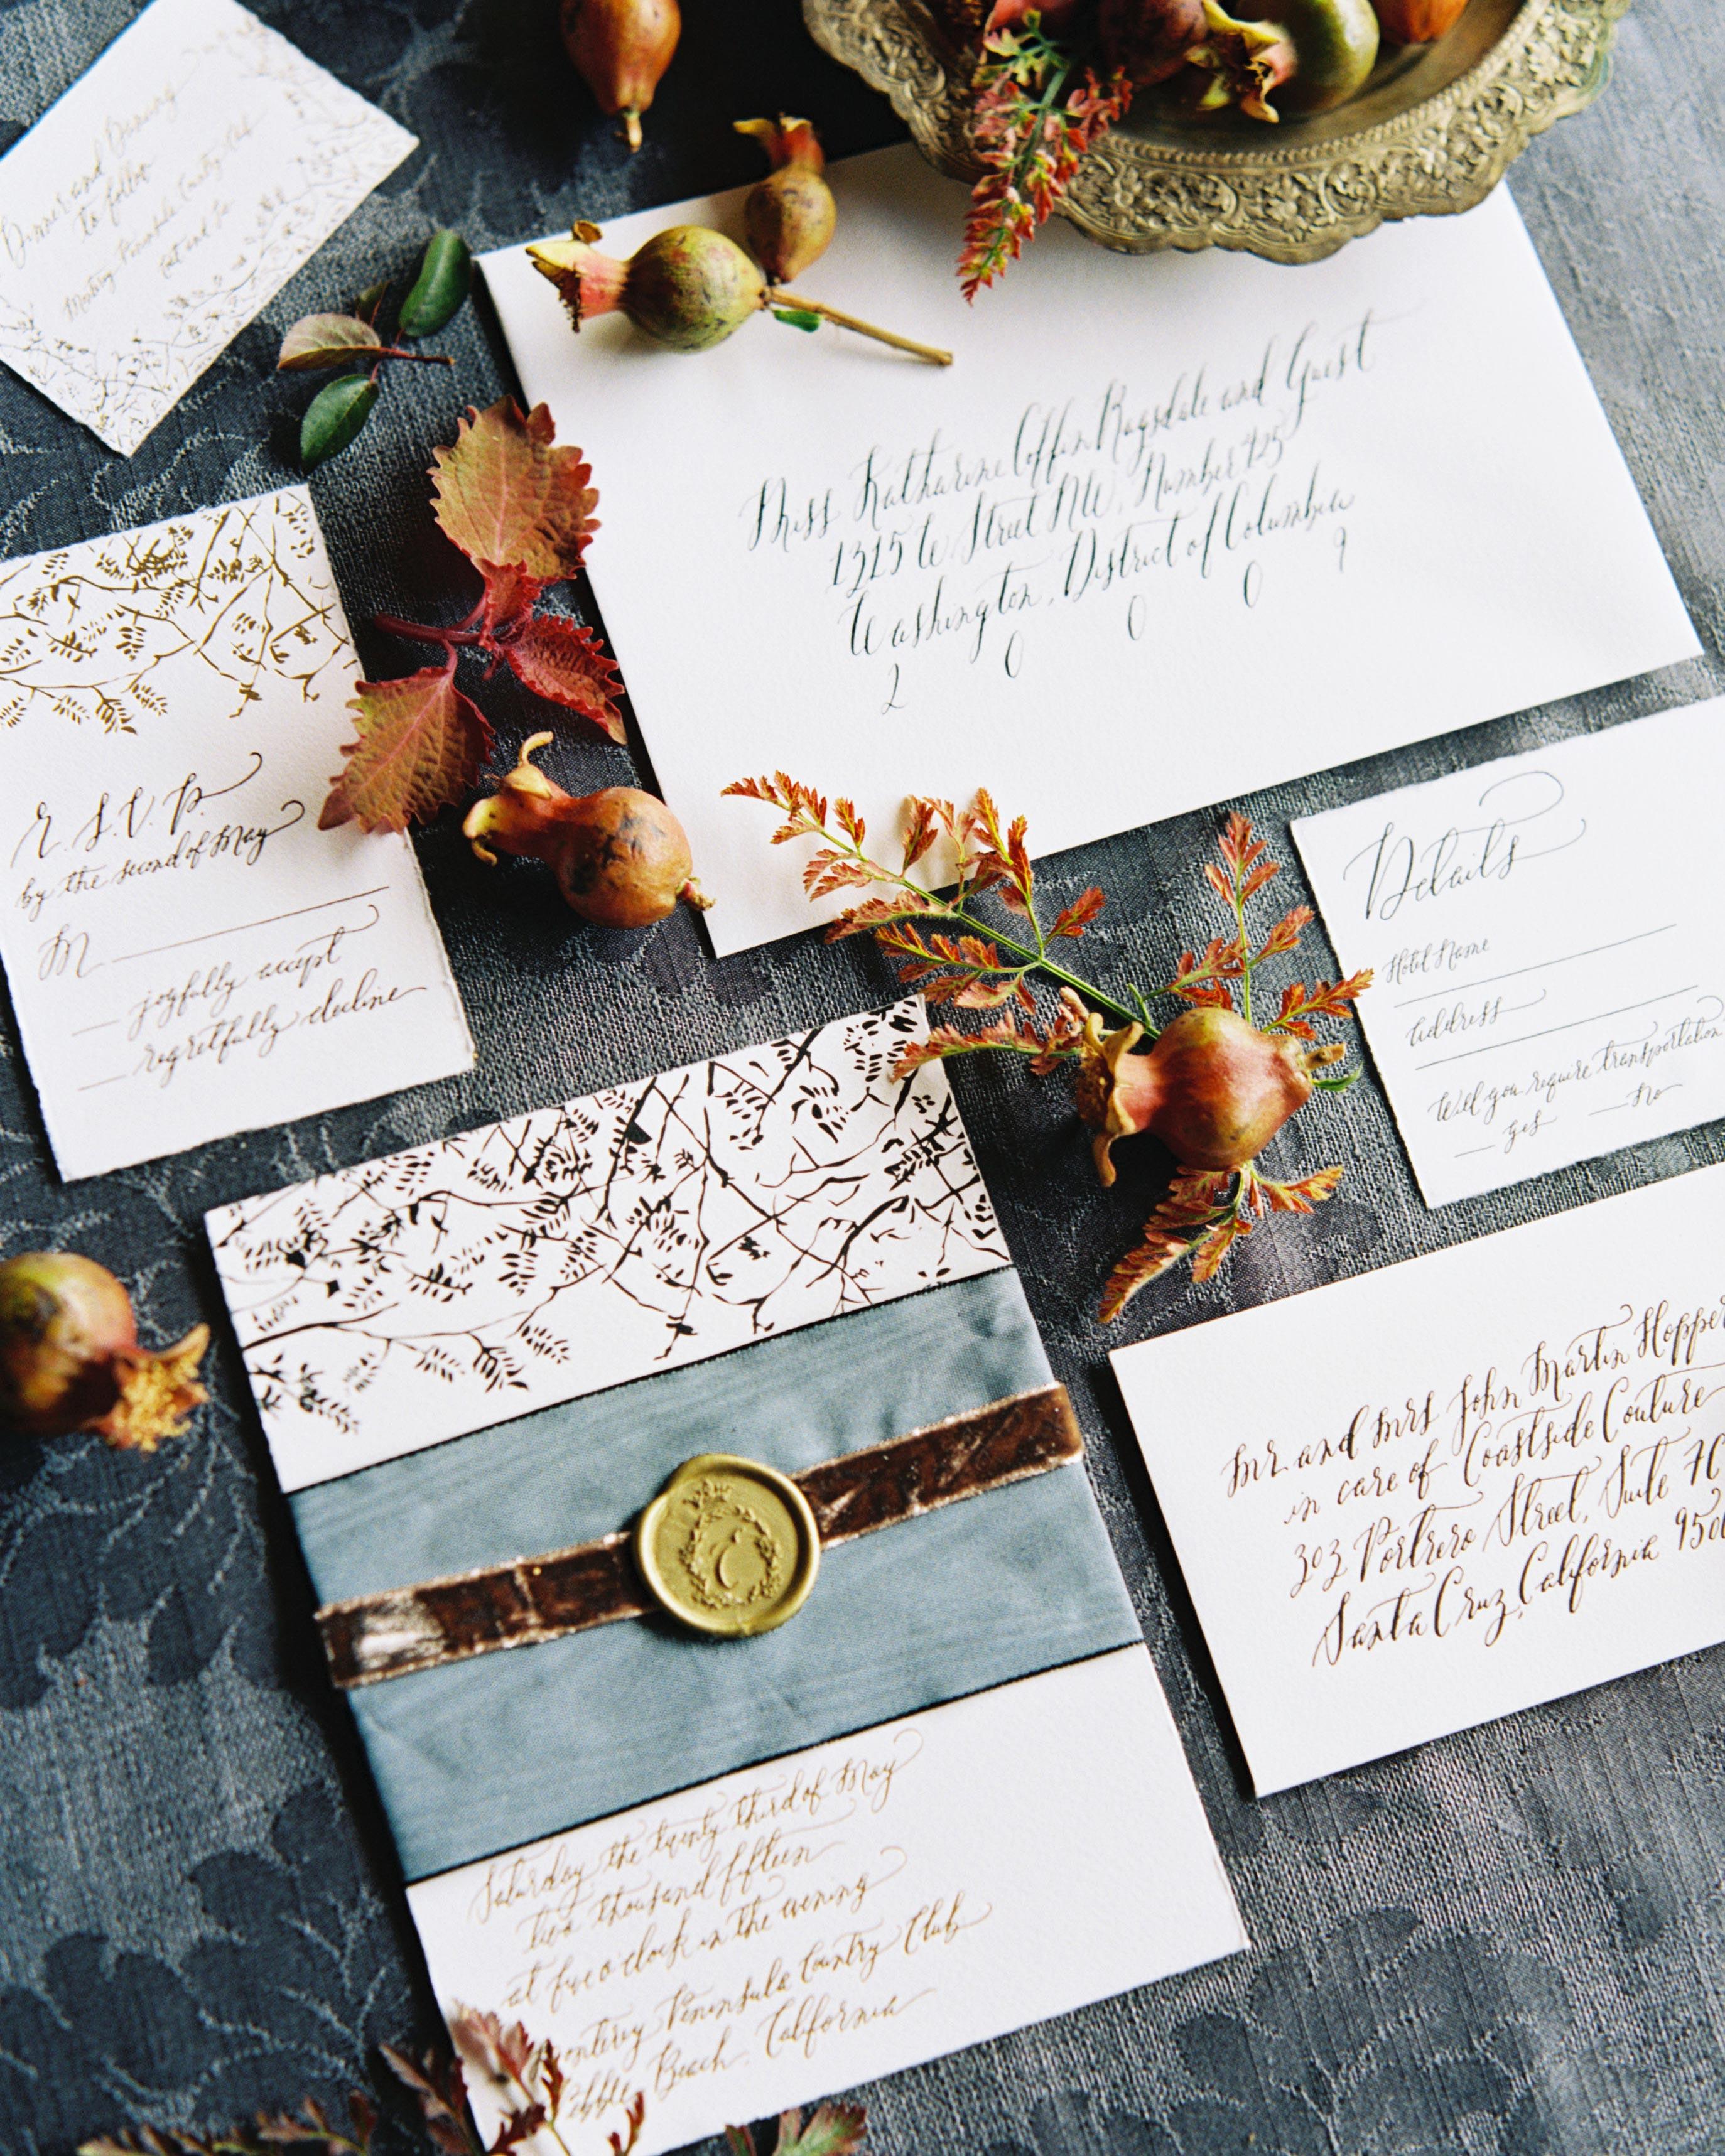 ginny-andrew-wedding-invites-0032-s112676-0216.jpg